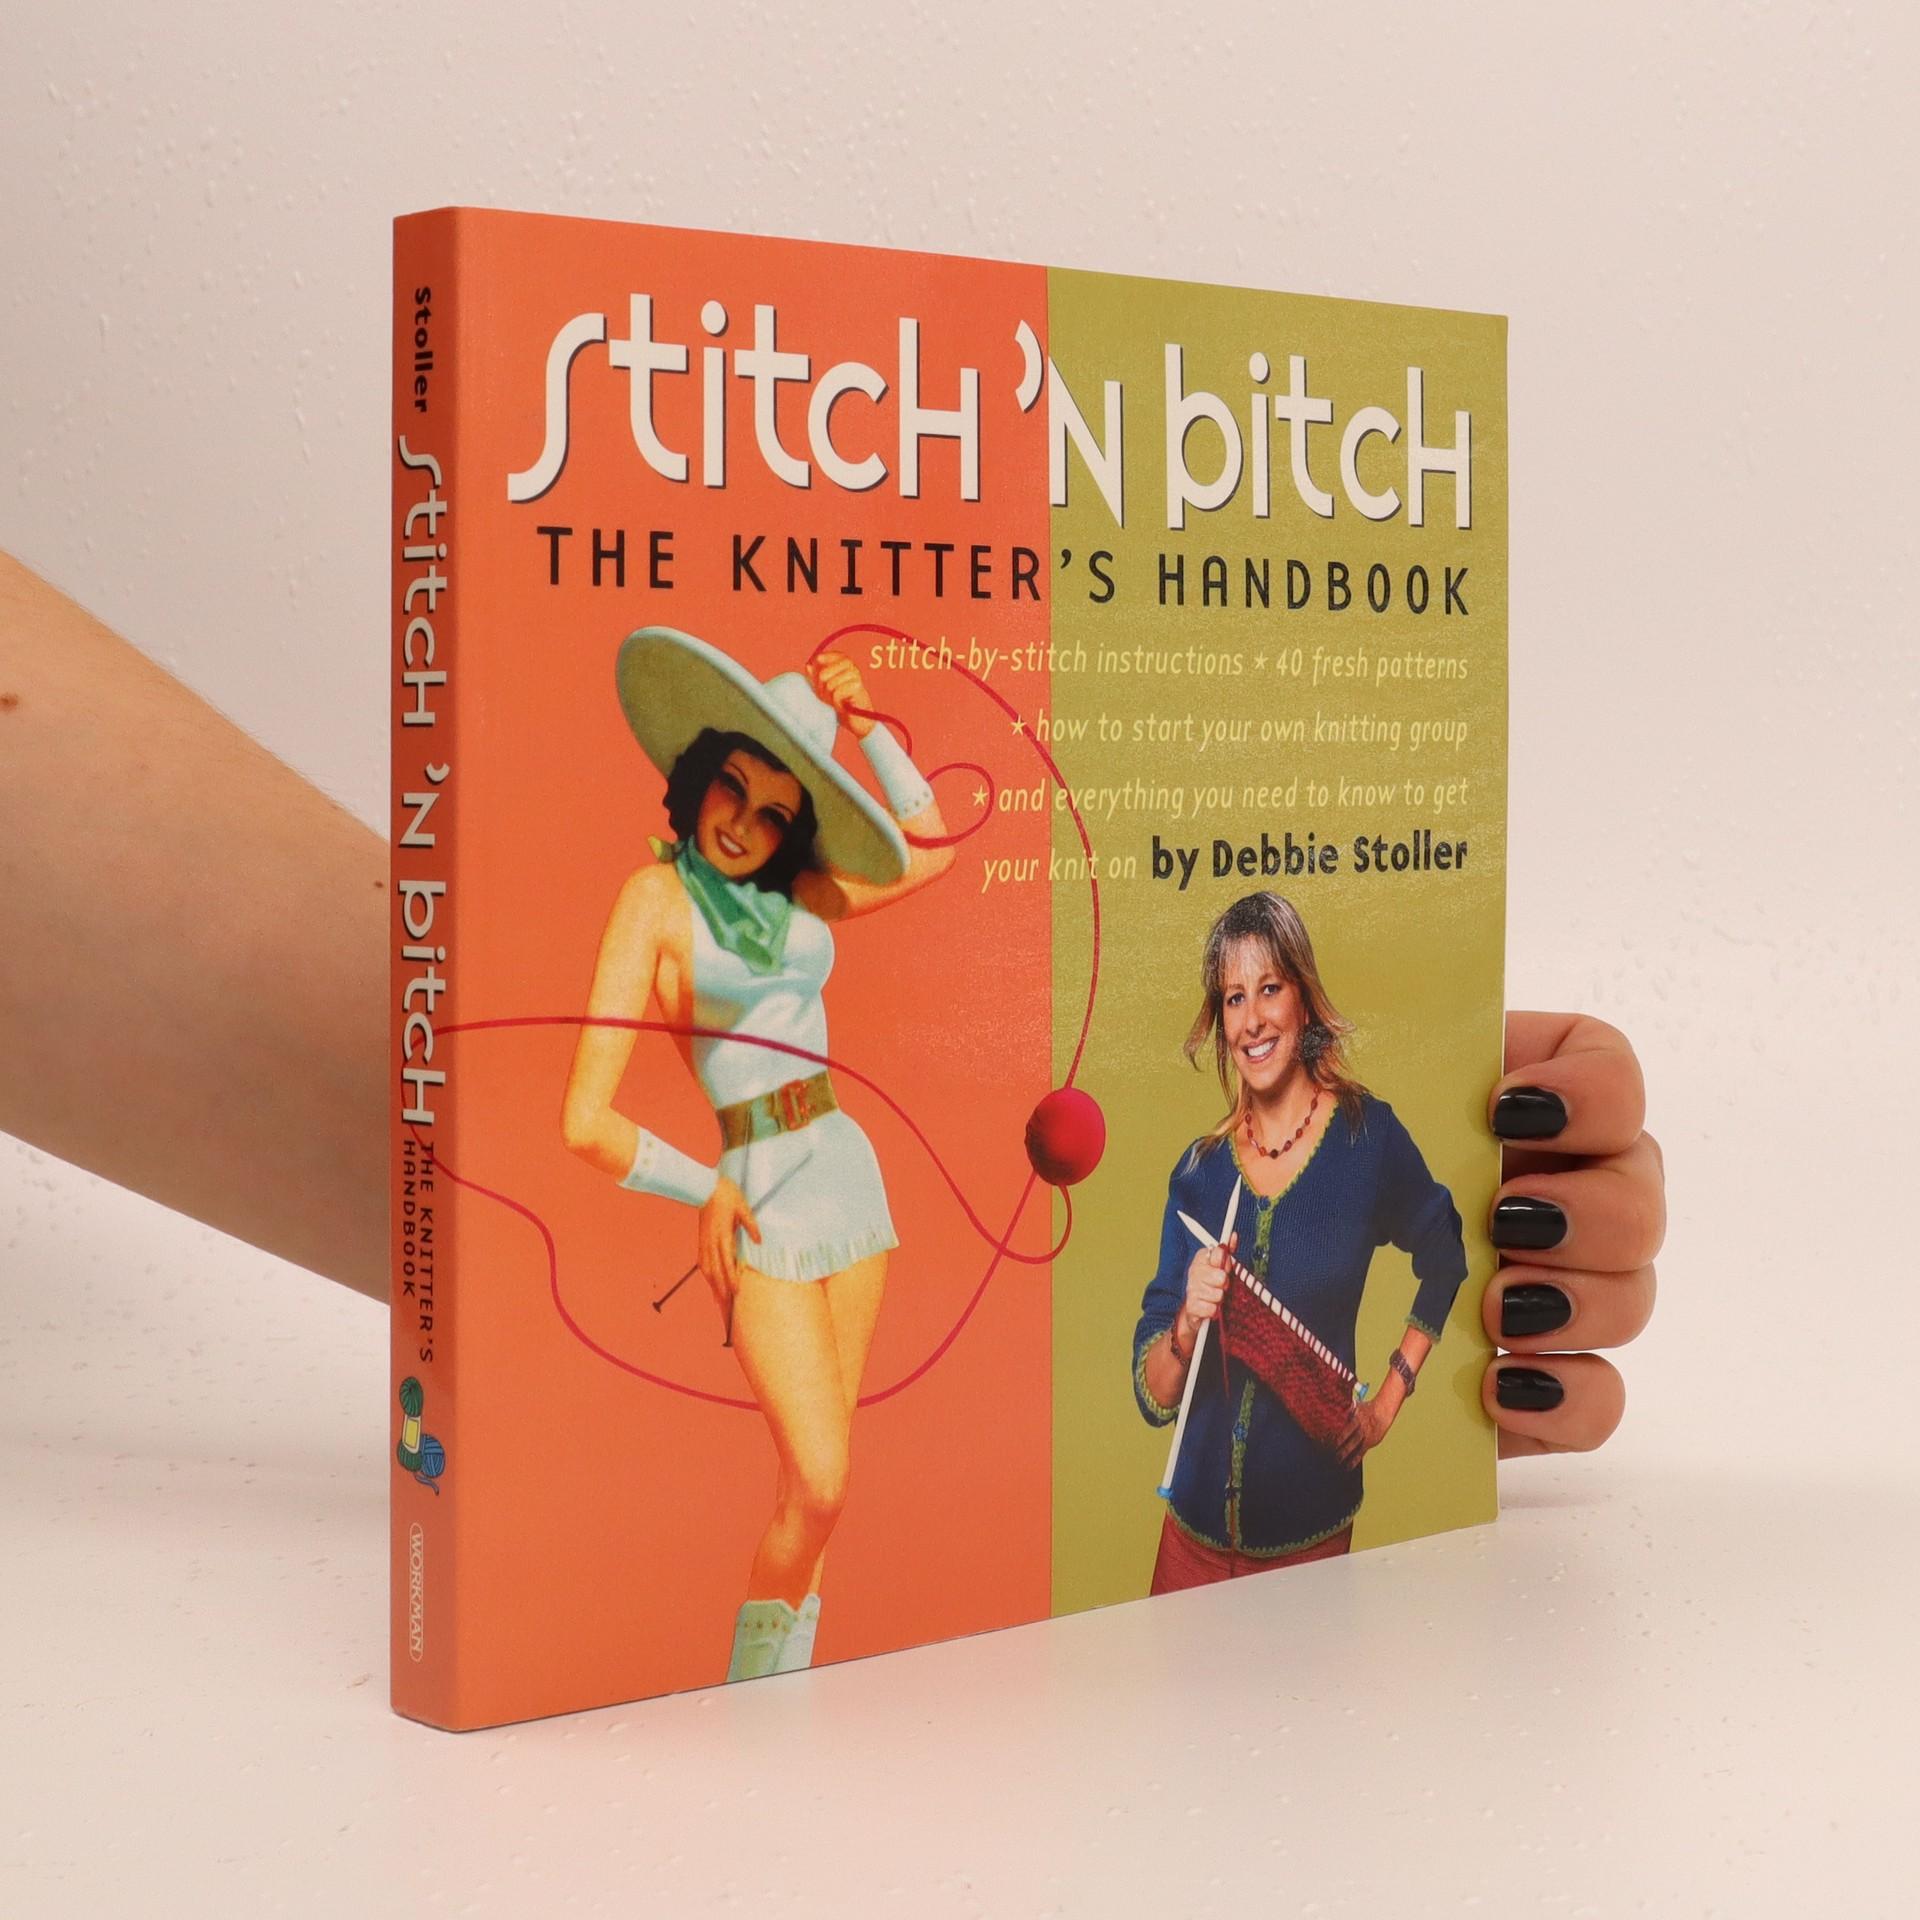 antikvární kniha Stitch 'n bitch : the knitter's handbook, 2003